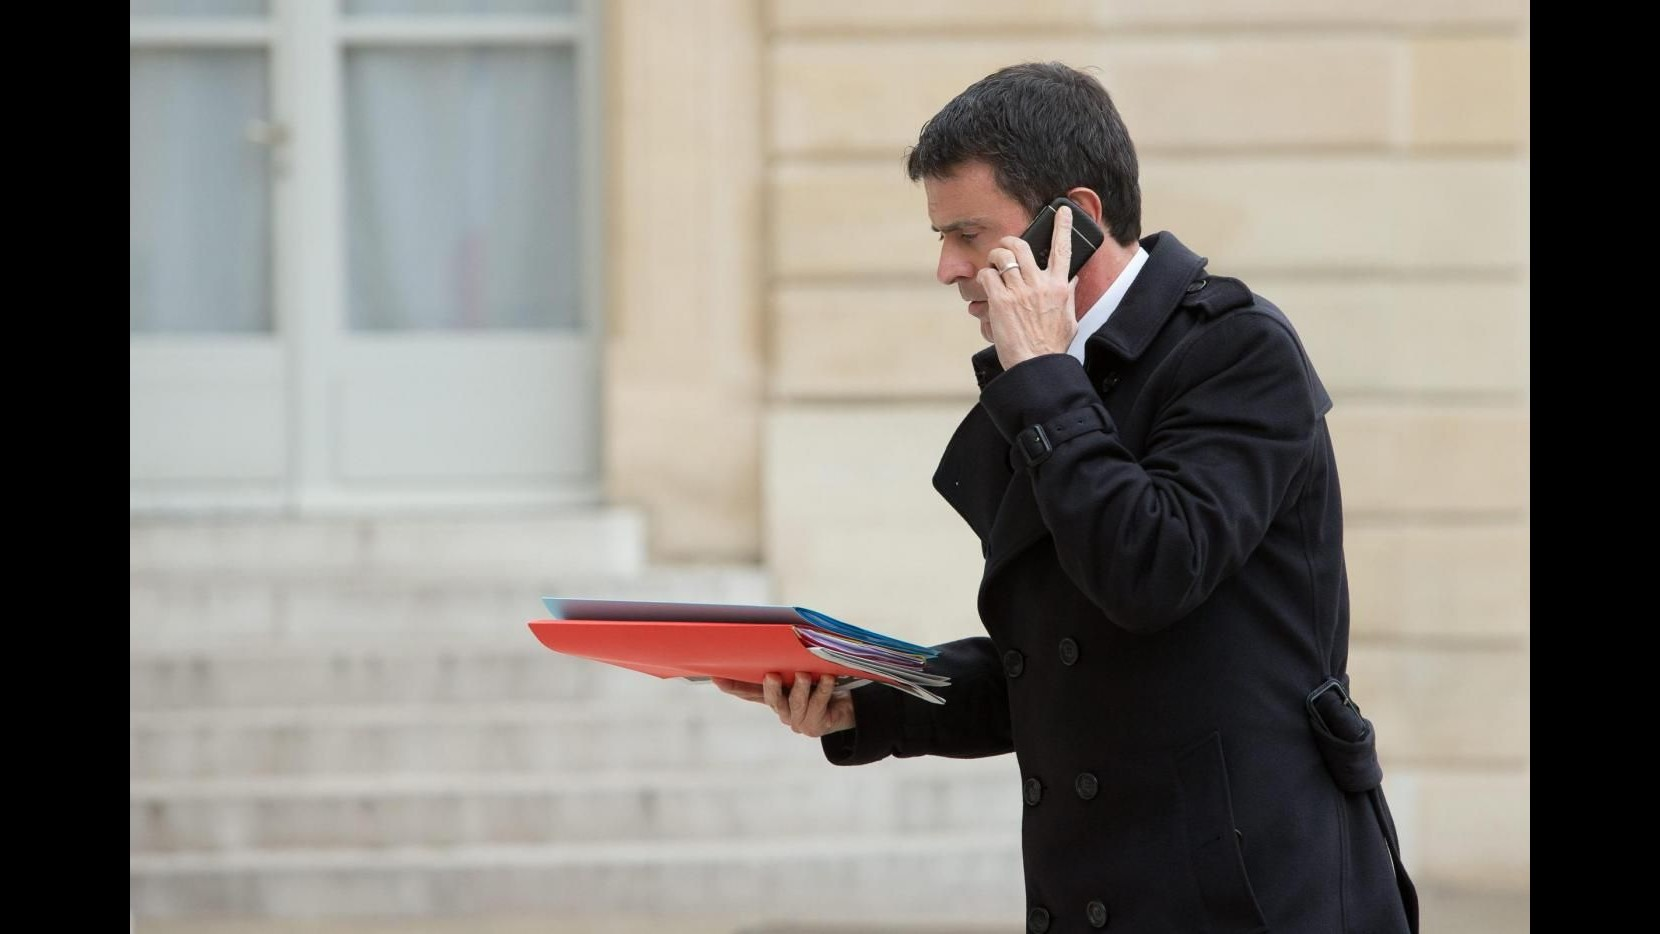 Parigi, Valls: Bisogna chiudere moschee e associazioni estremiste